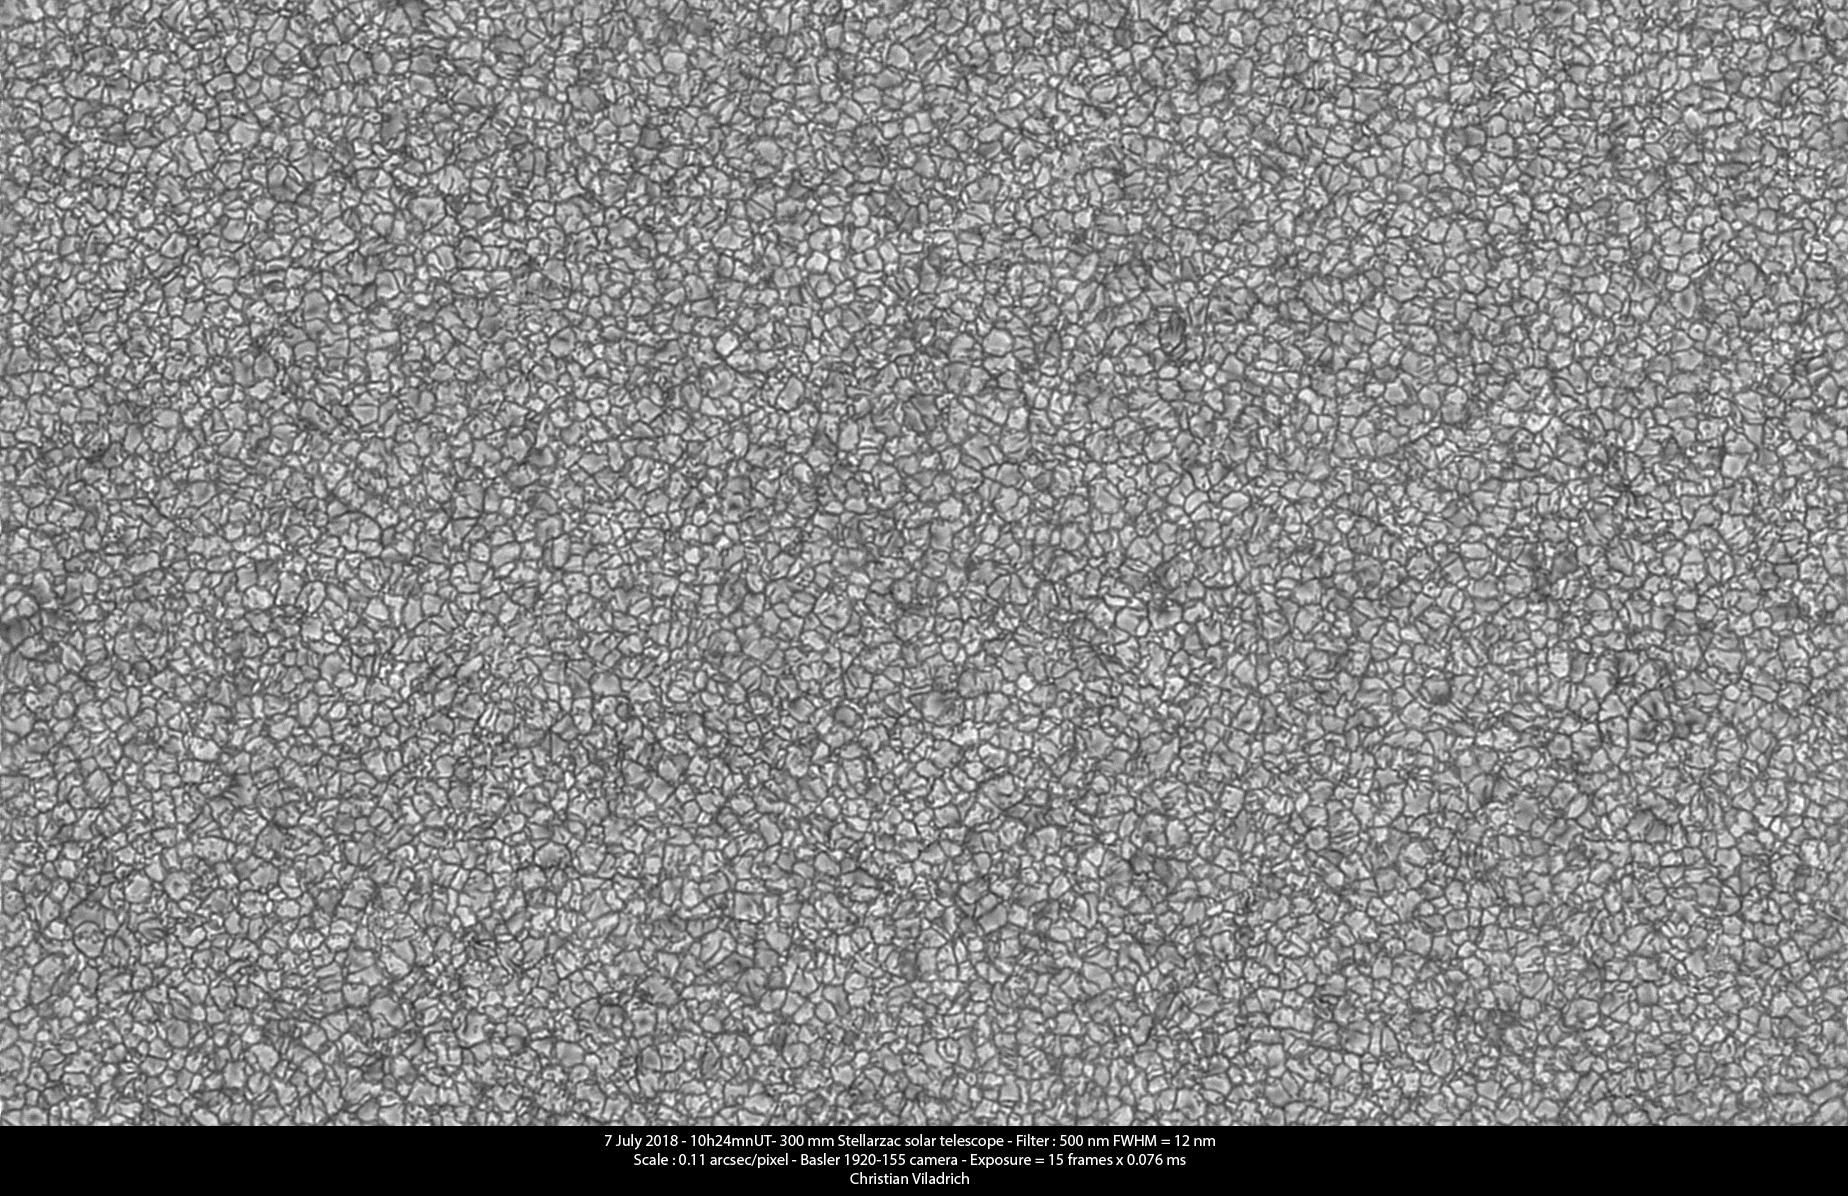 granulation-7July2018-10h24mnUT-N300-500